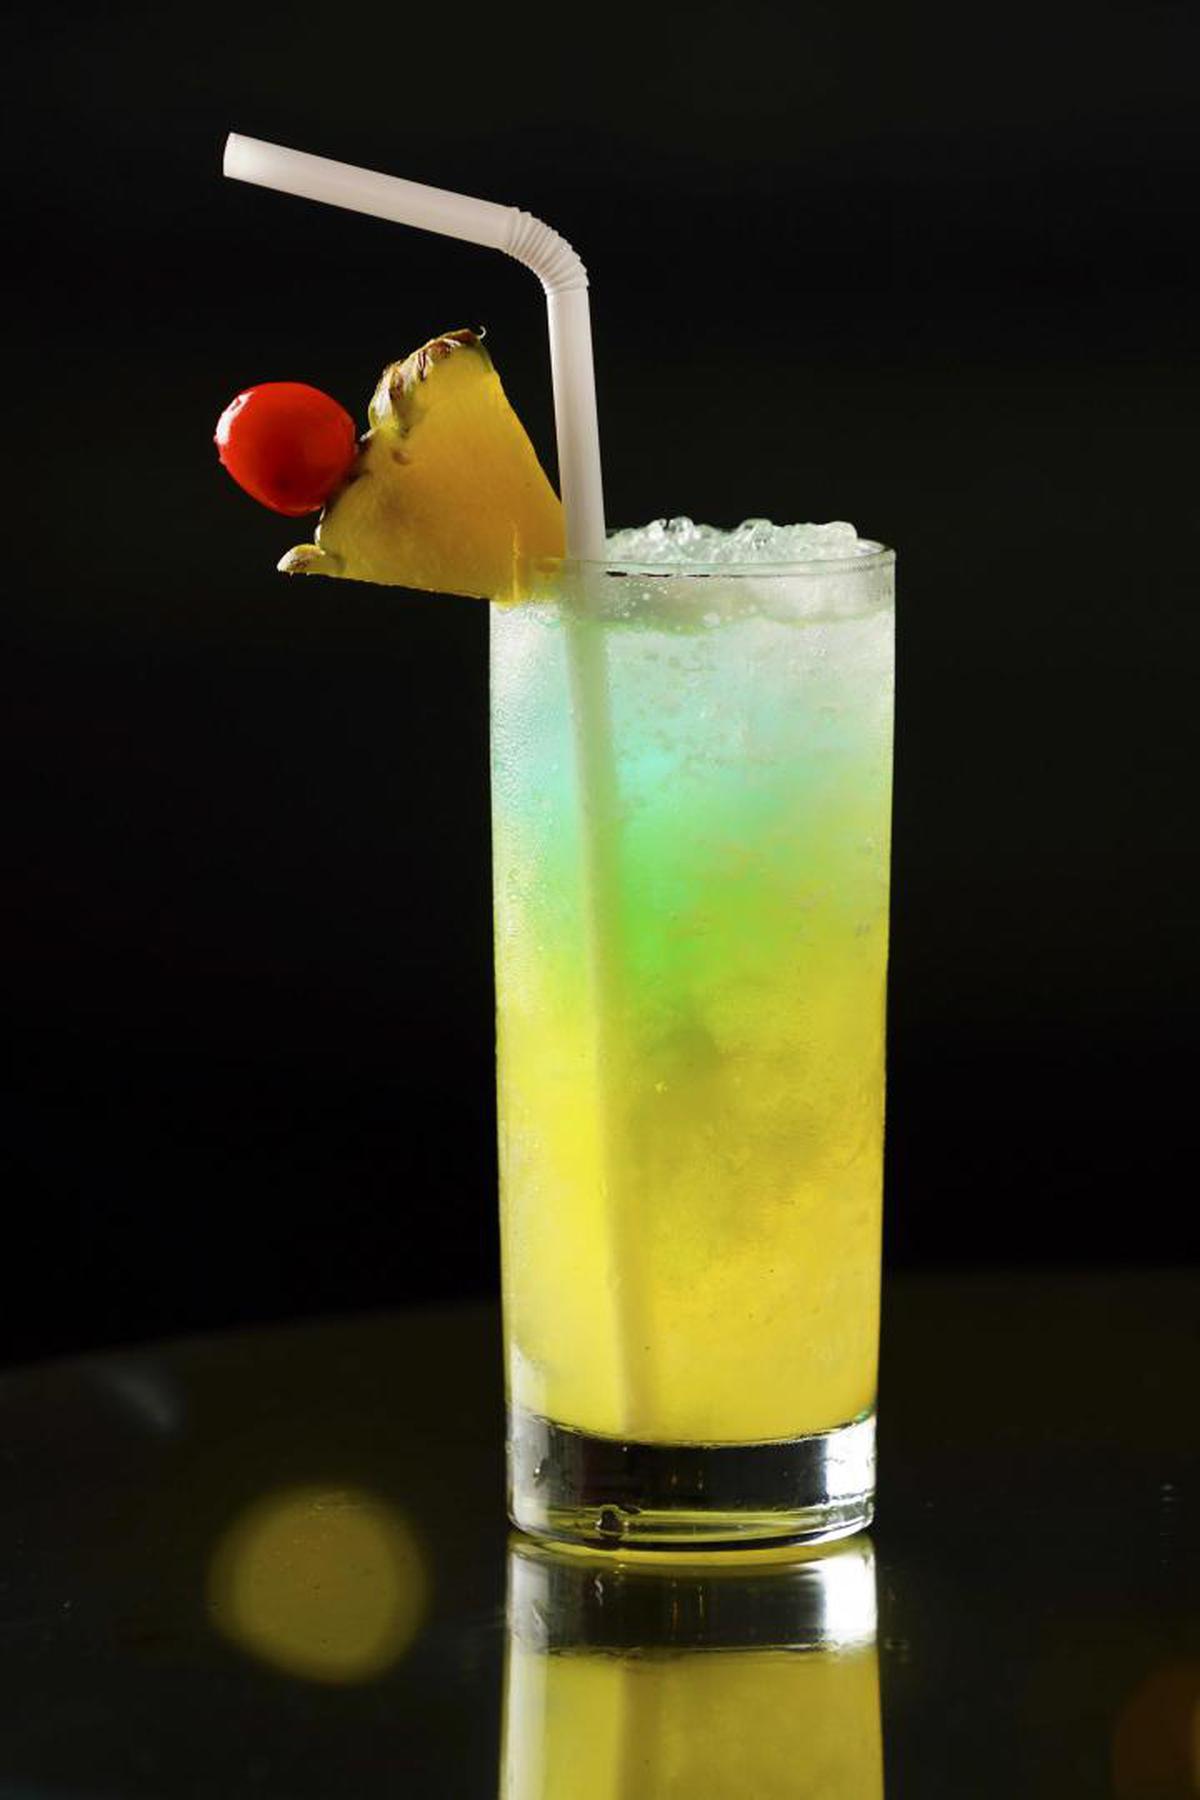 Image of Drink, Cocktail garnish, Non-alcoholic beverage, Alcoholic beverage, Rum swizzle, Tom collins etc.